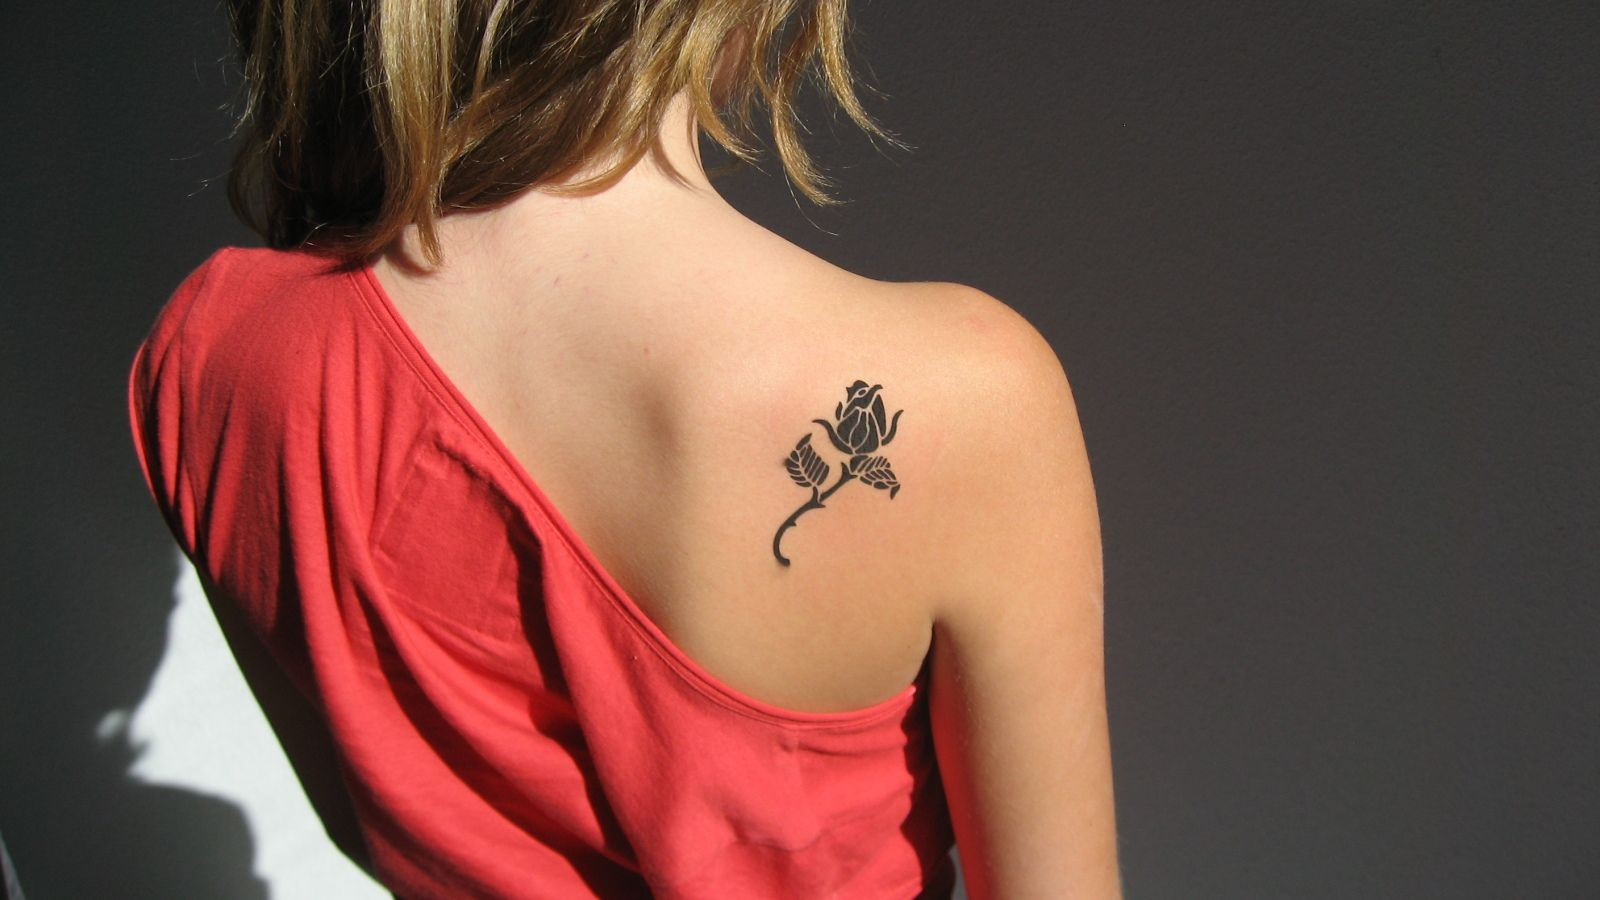 Back Shoulder Black Small Flower Tattoos Designs Tattoos inside size 1600 X 900